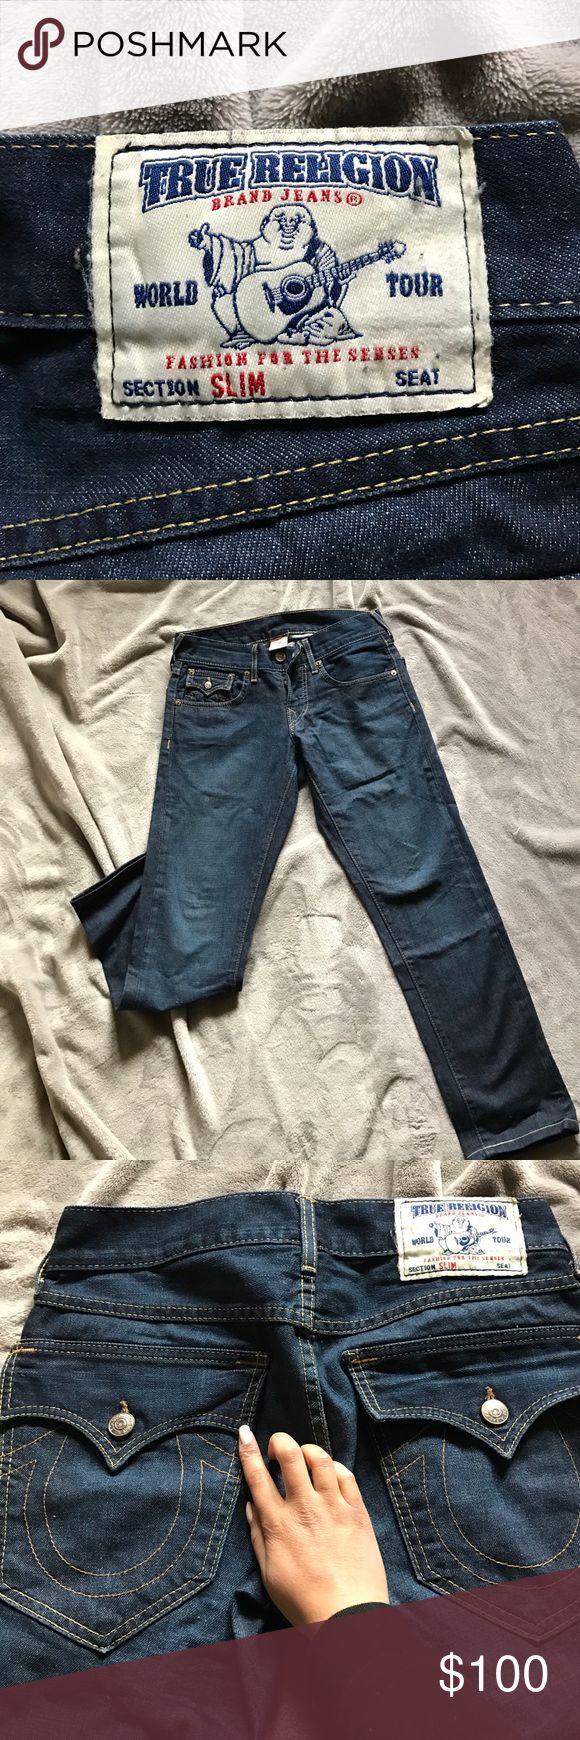 "True Religion Slim jeans Men's authentic slim fit jeans size 28 dark blue in great condition. Approximately 30"" inseam True Religion Jeans Slim"